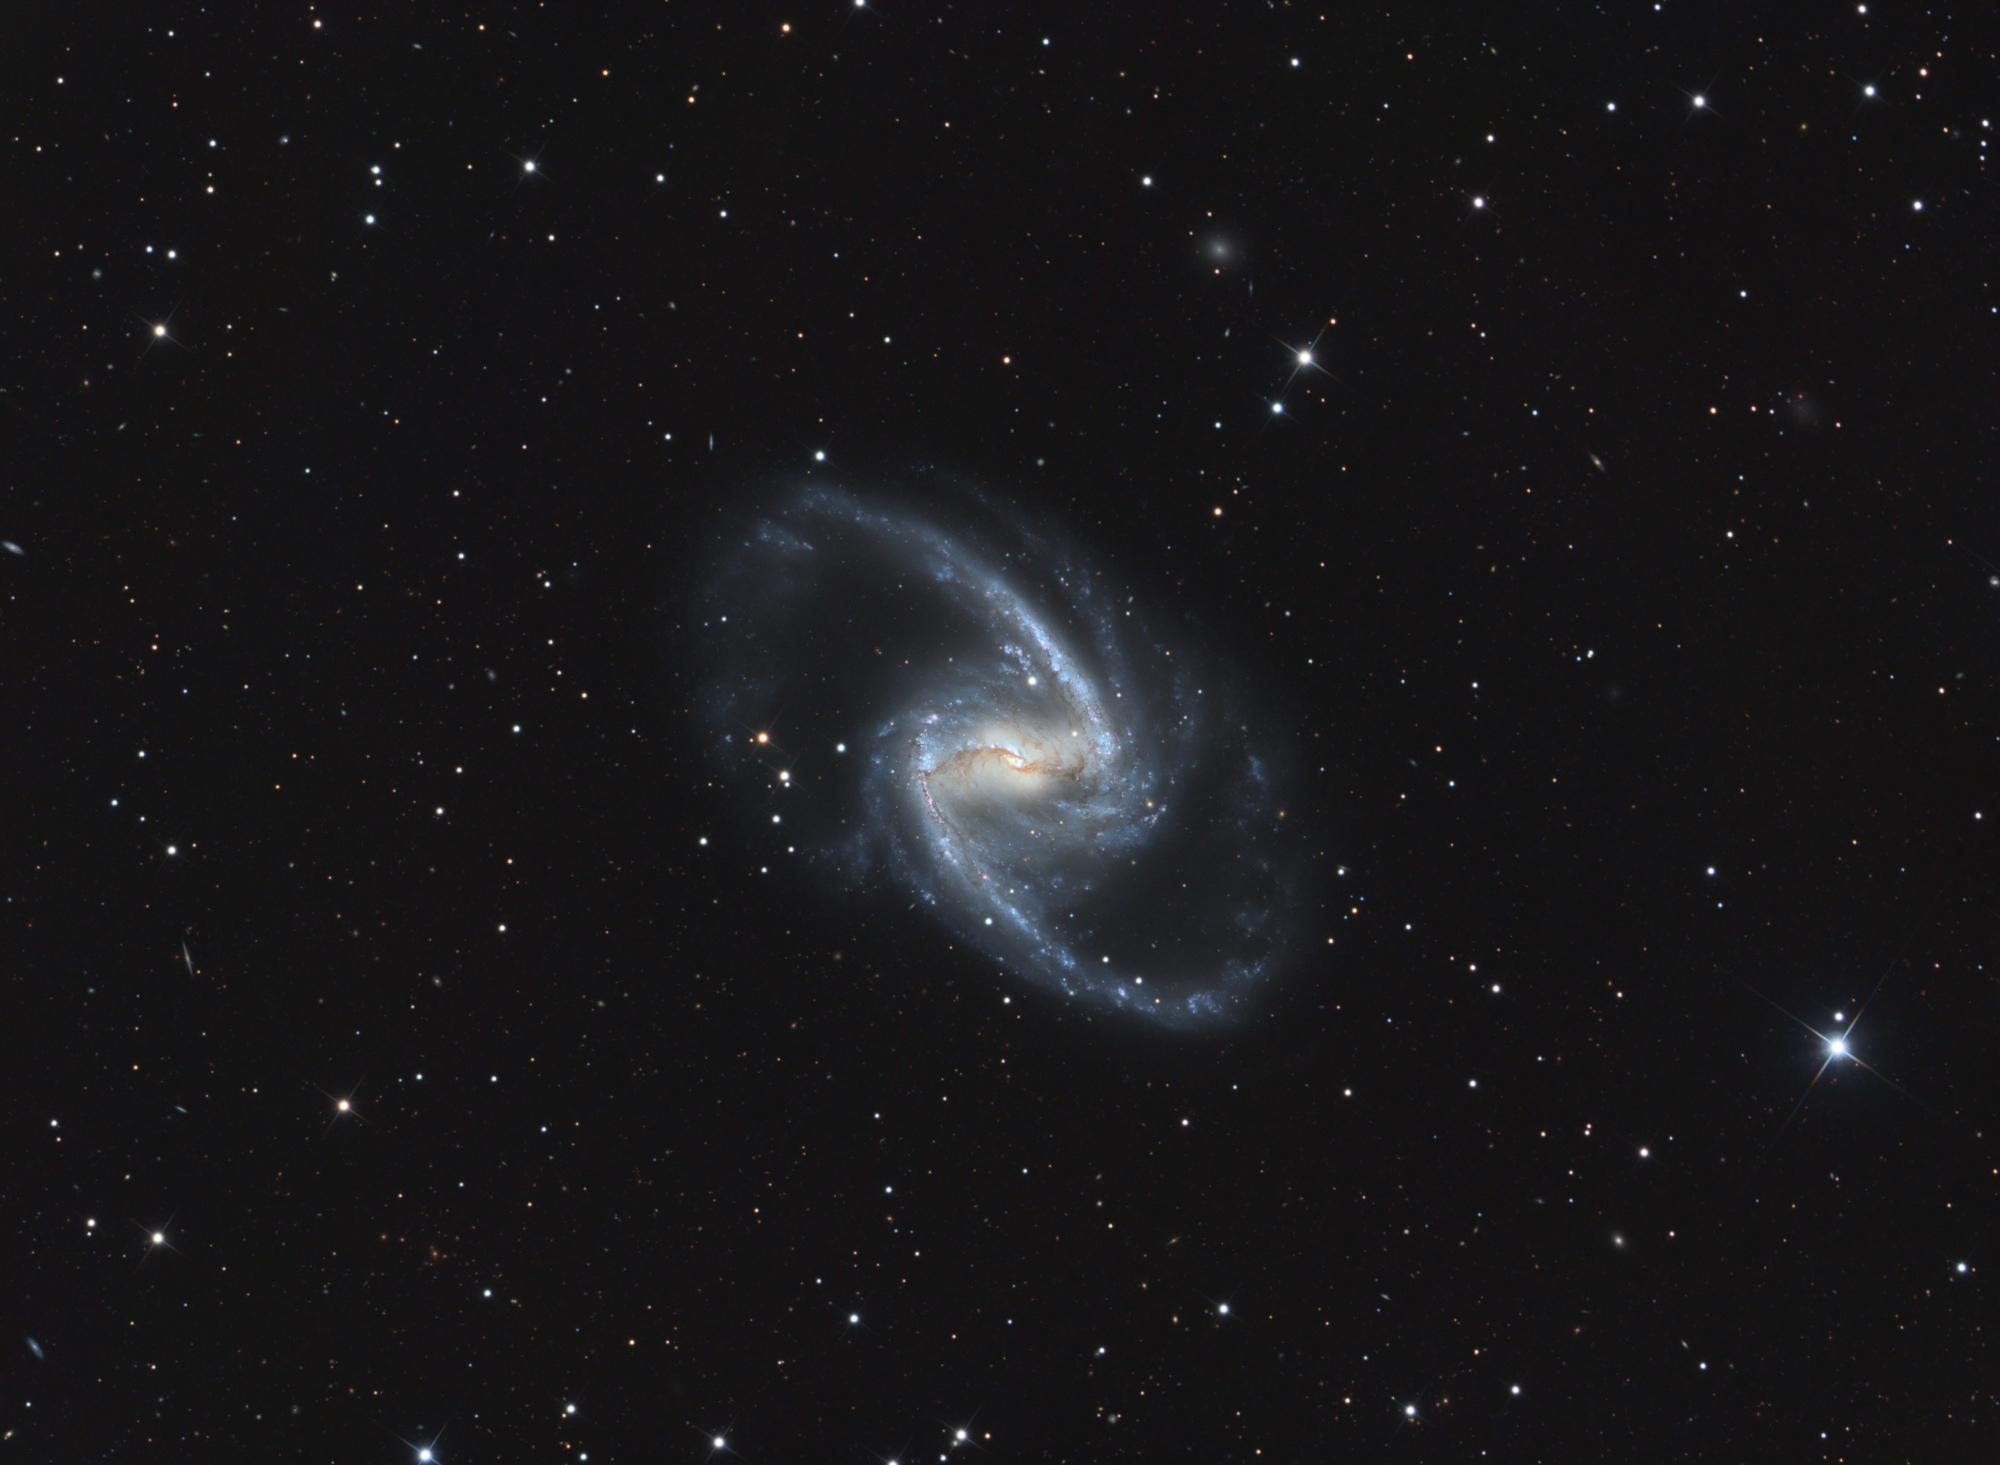 NGC1365_LRVB-V4.thumb.jpg.5f57a051ce5edd146b6a704a0fa01bec.jpg